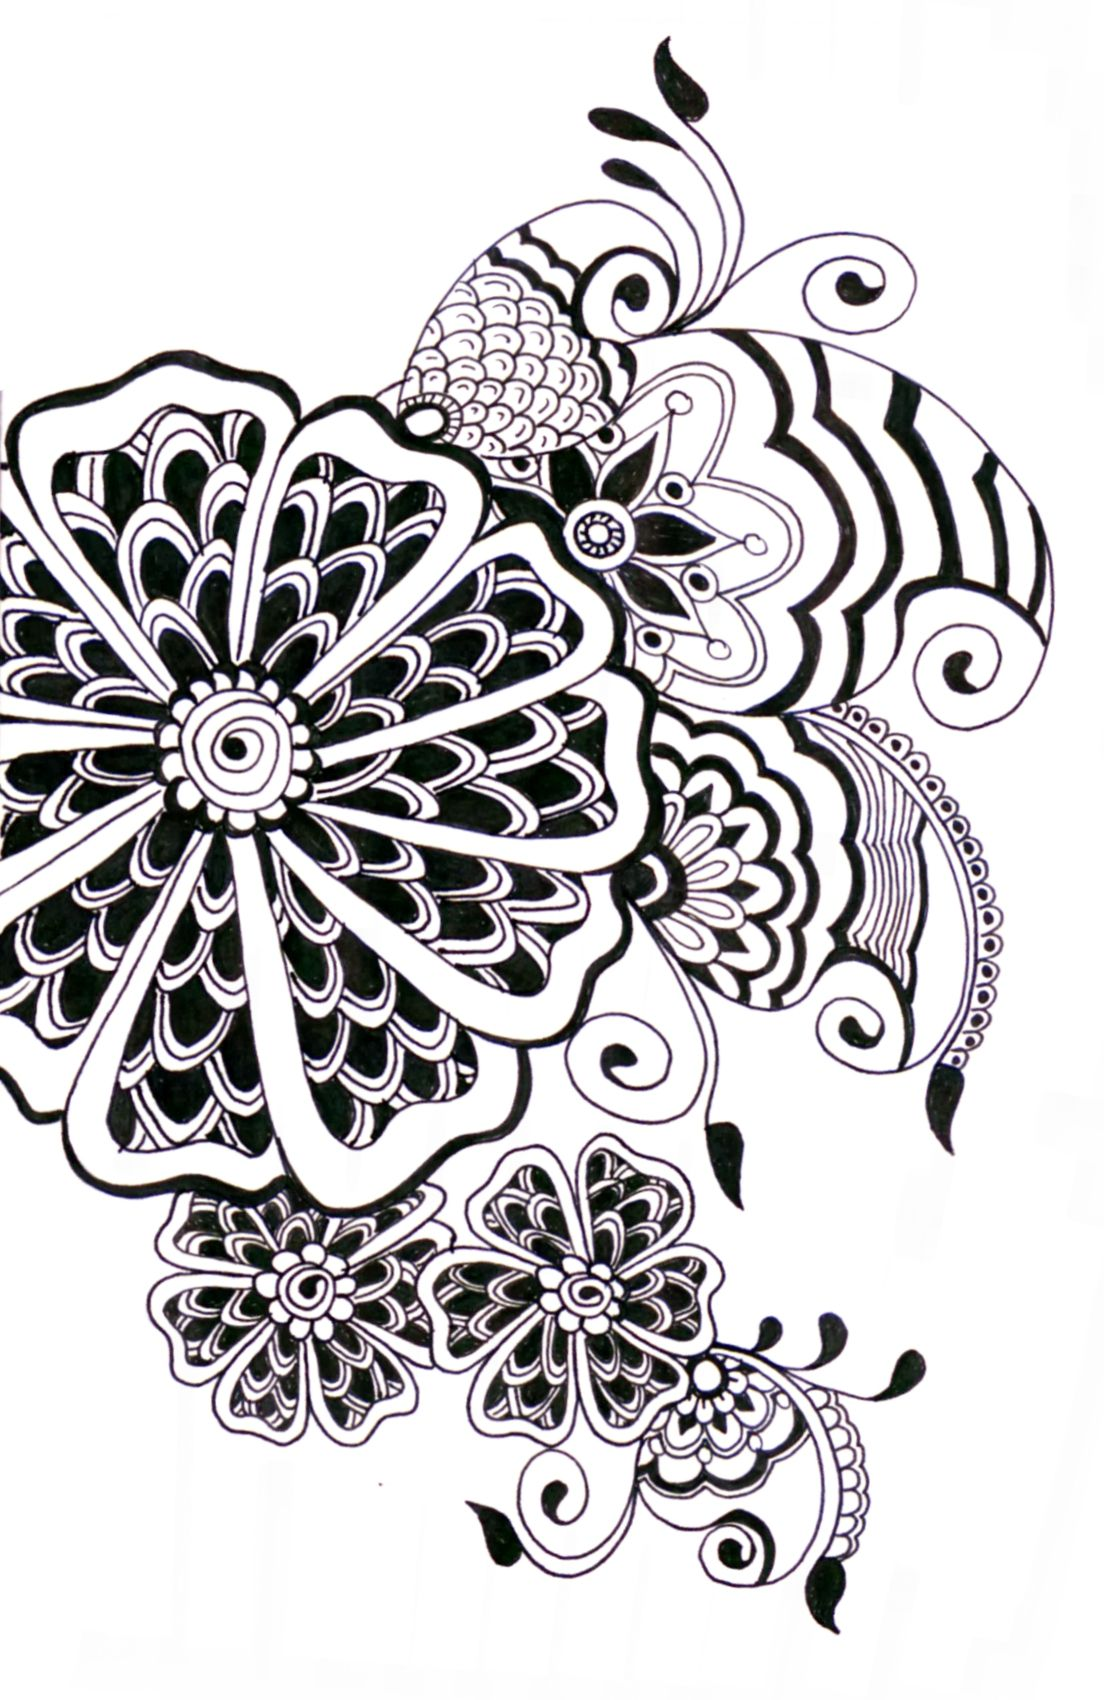 zentangle   obrázky   Pinterest   Mandalas, Zentangle y Dibujo